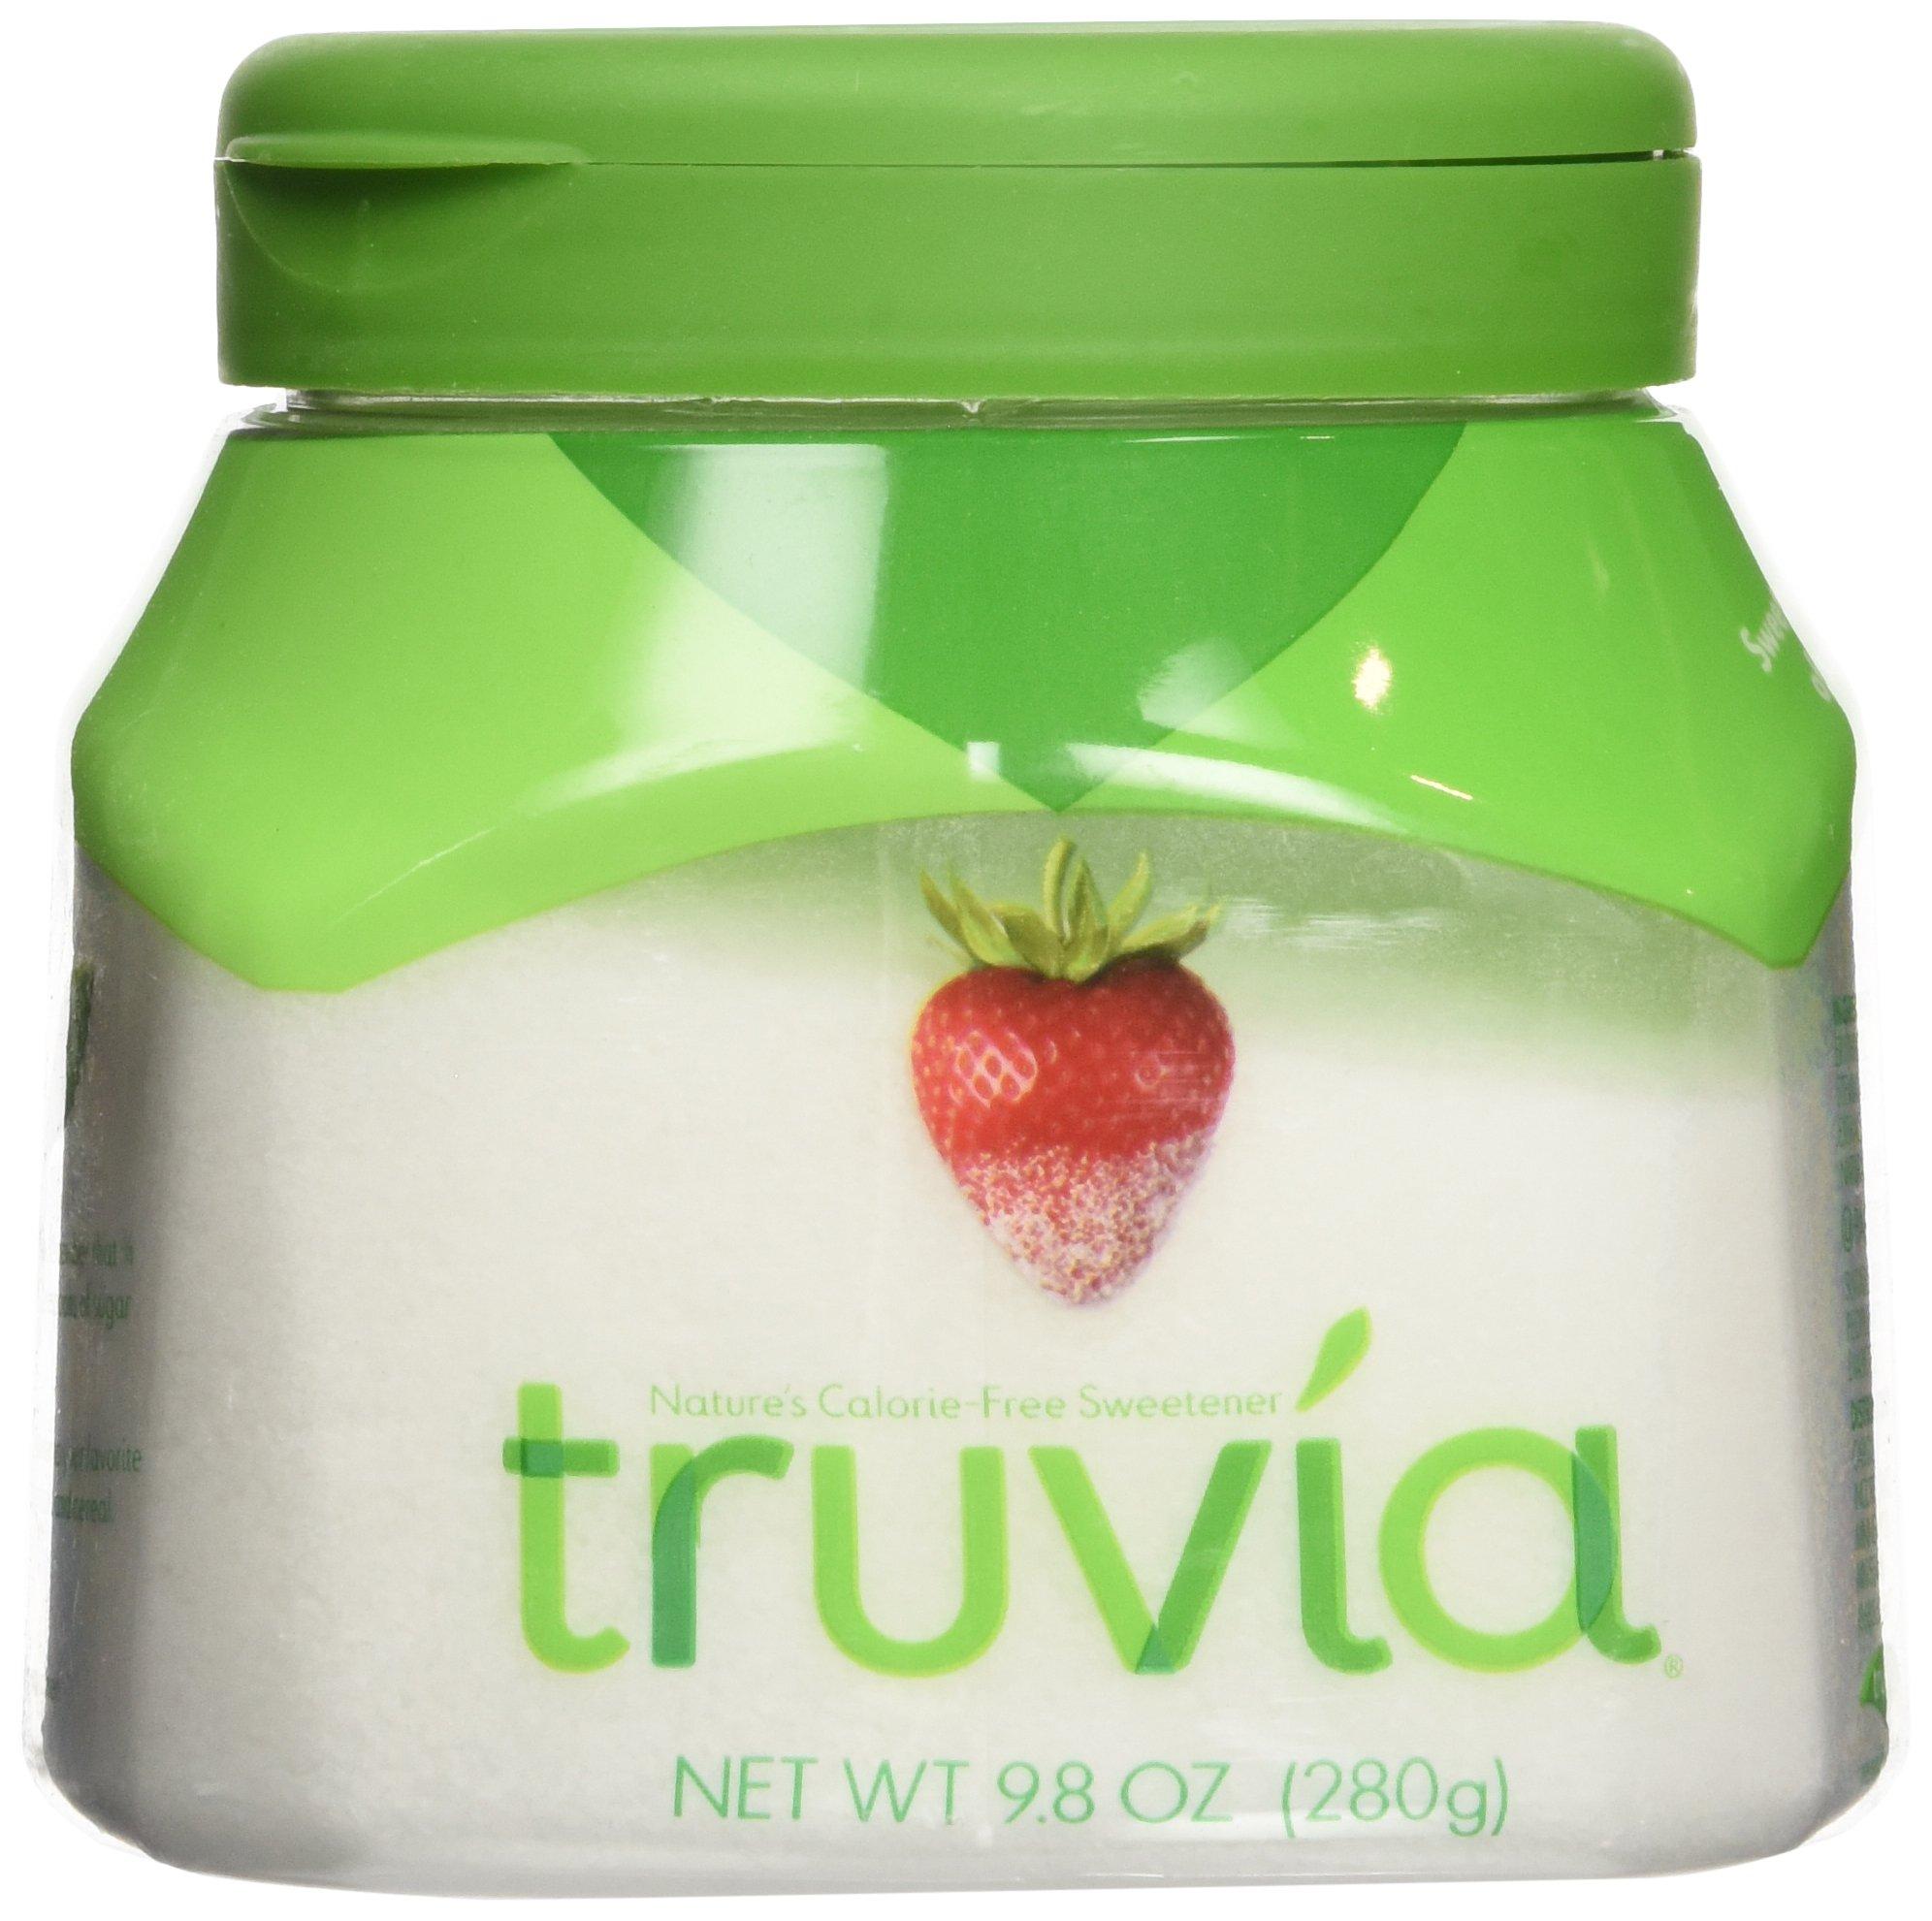 Truvia Calorie Free Sweetener, 9.8 oz jar (Pack of 4) by Truvia